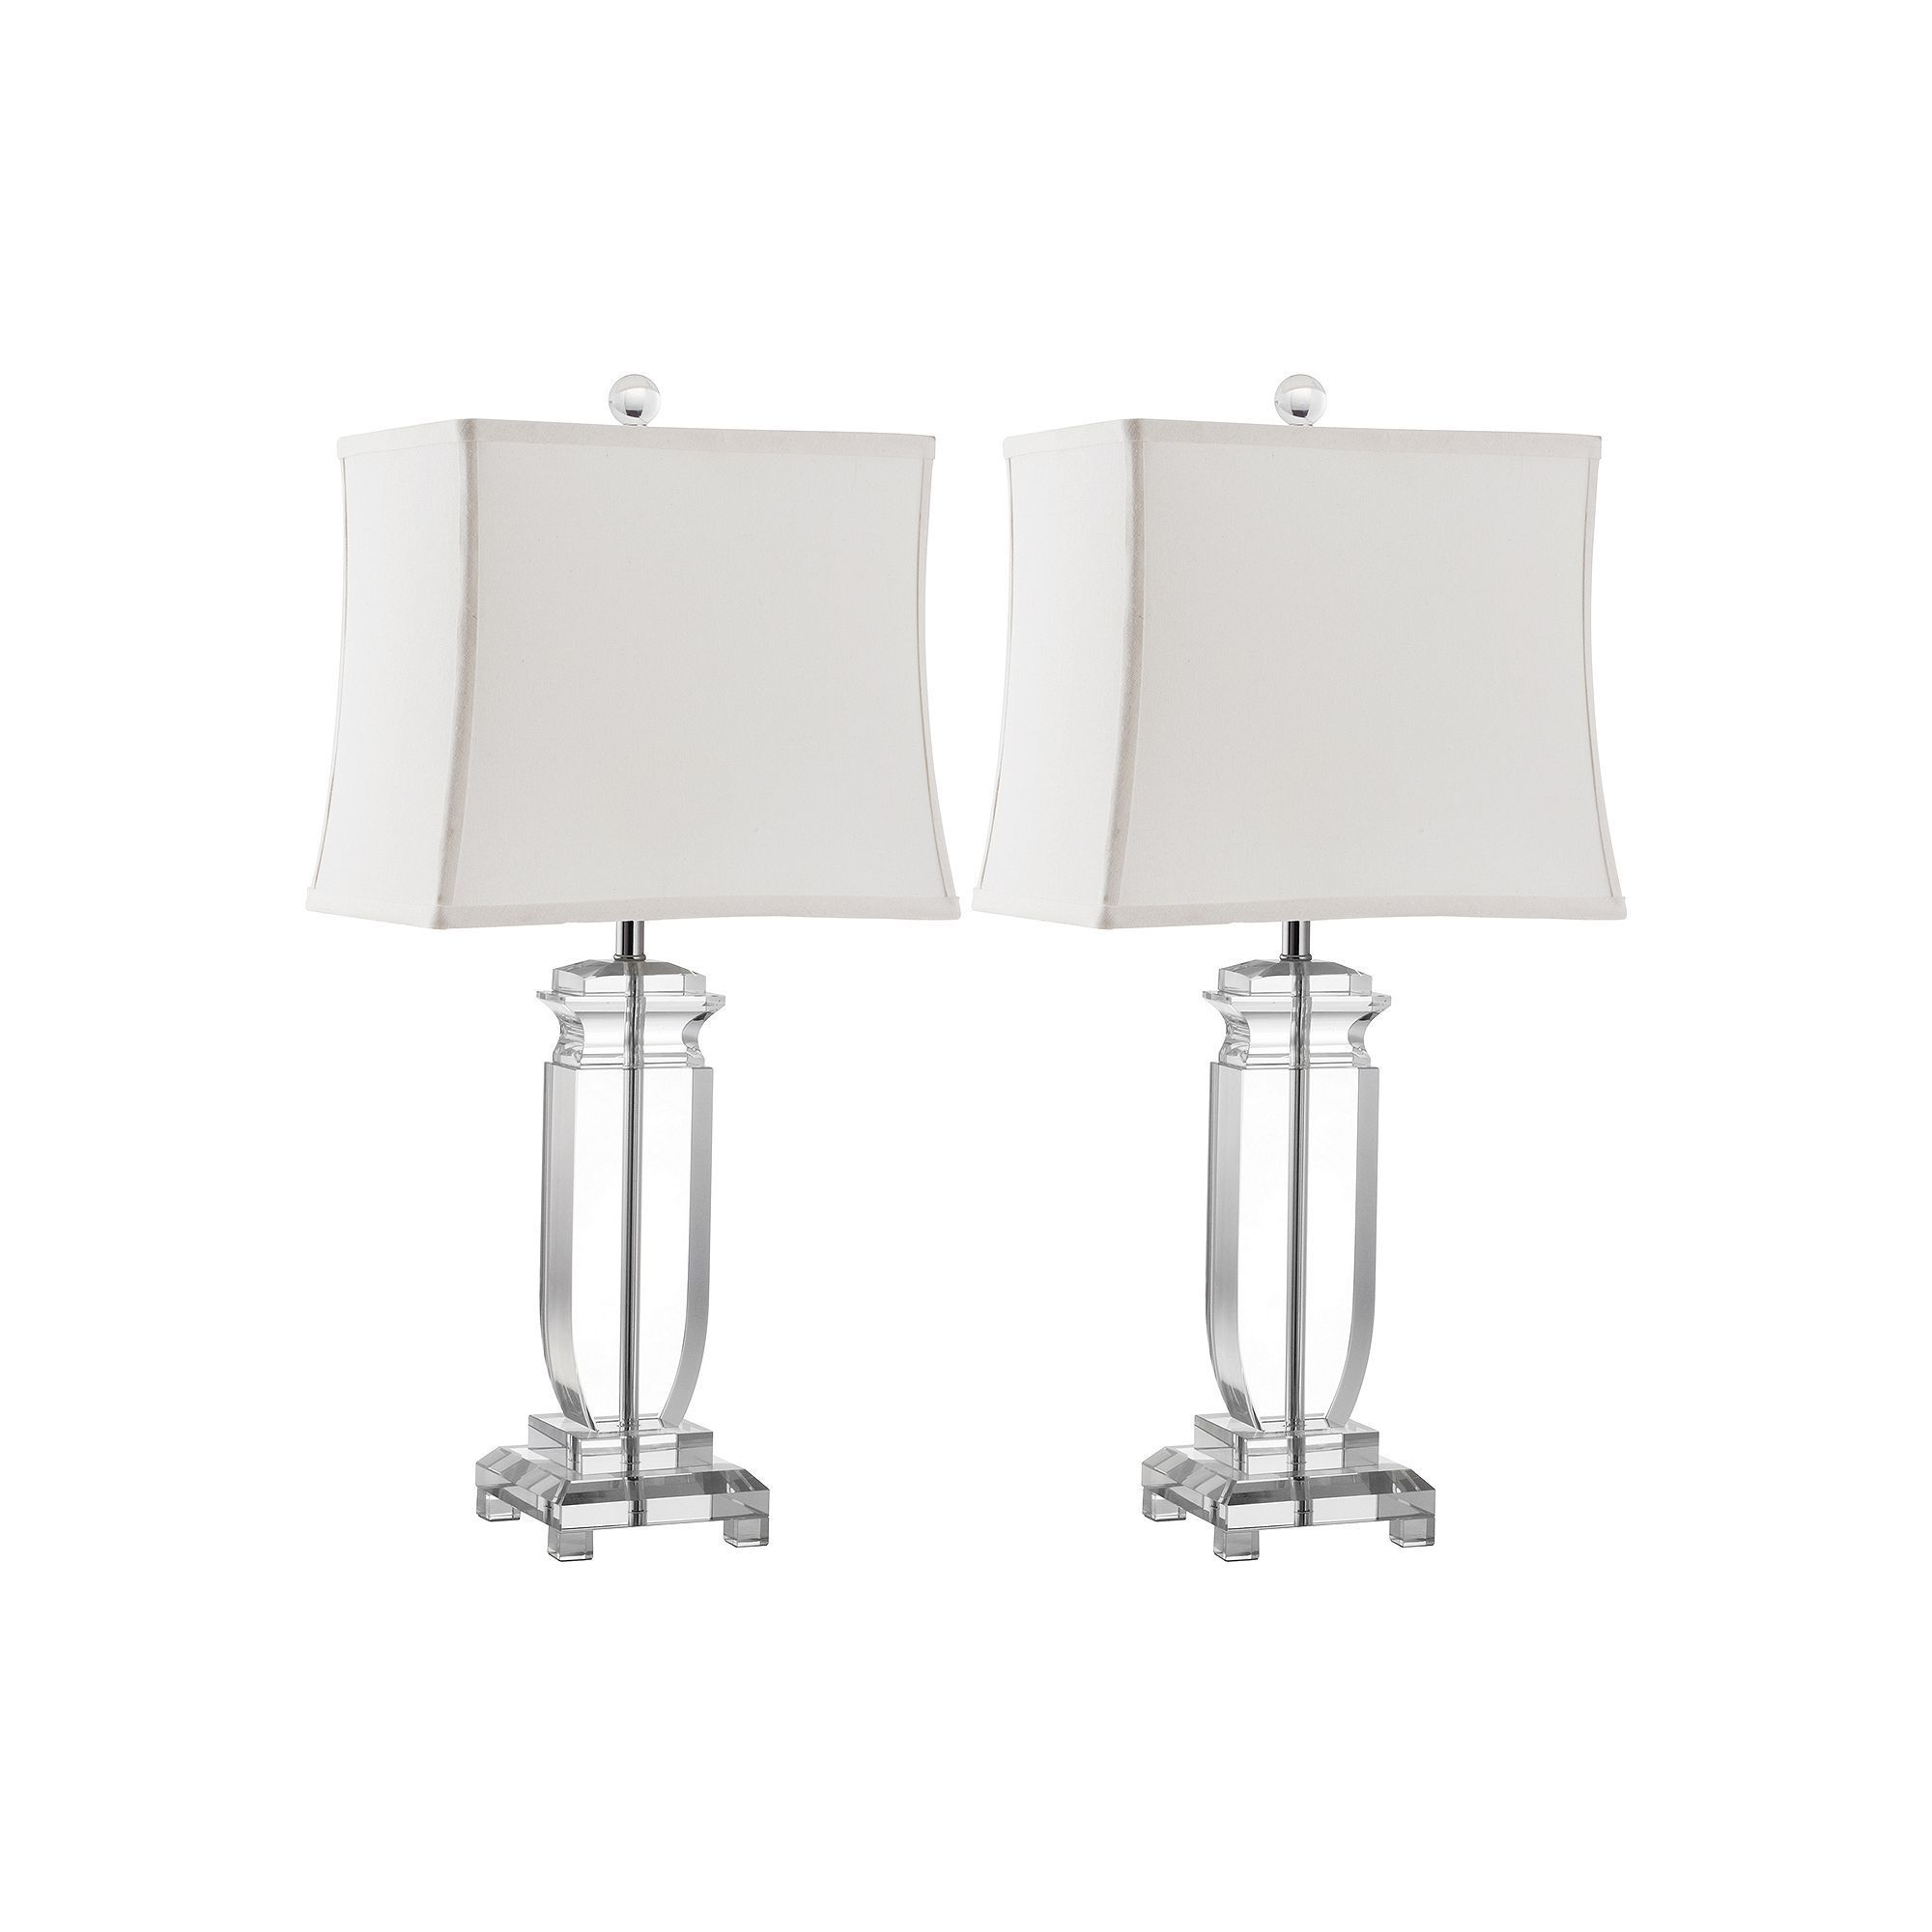 Safavieh 2 Piece Olympia Crystal Table Lamp Set Table Lamp Sets